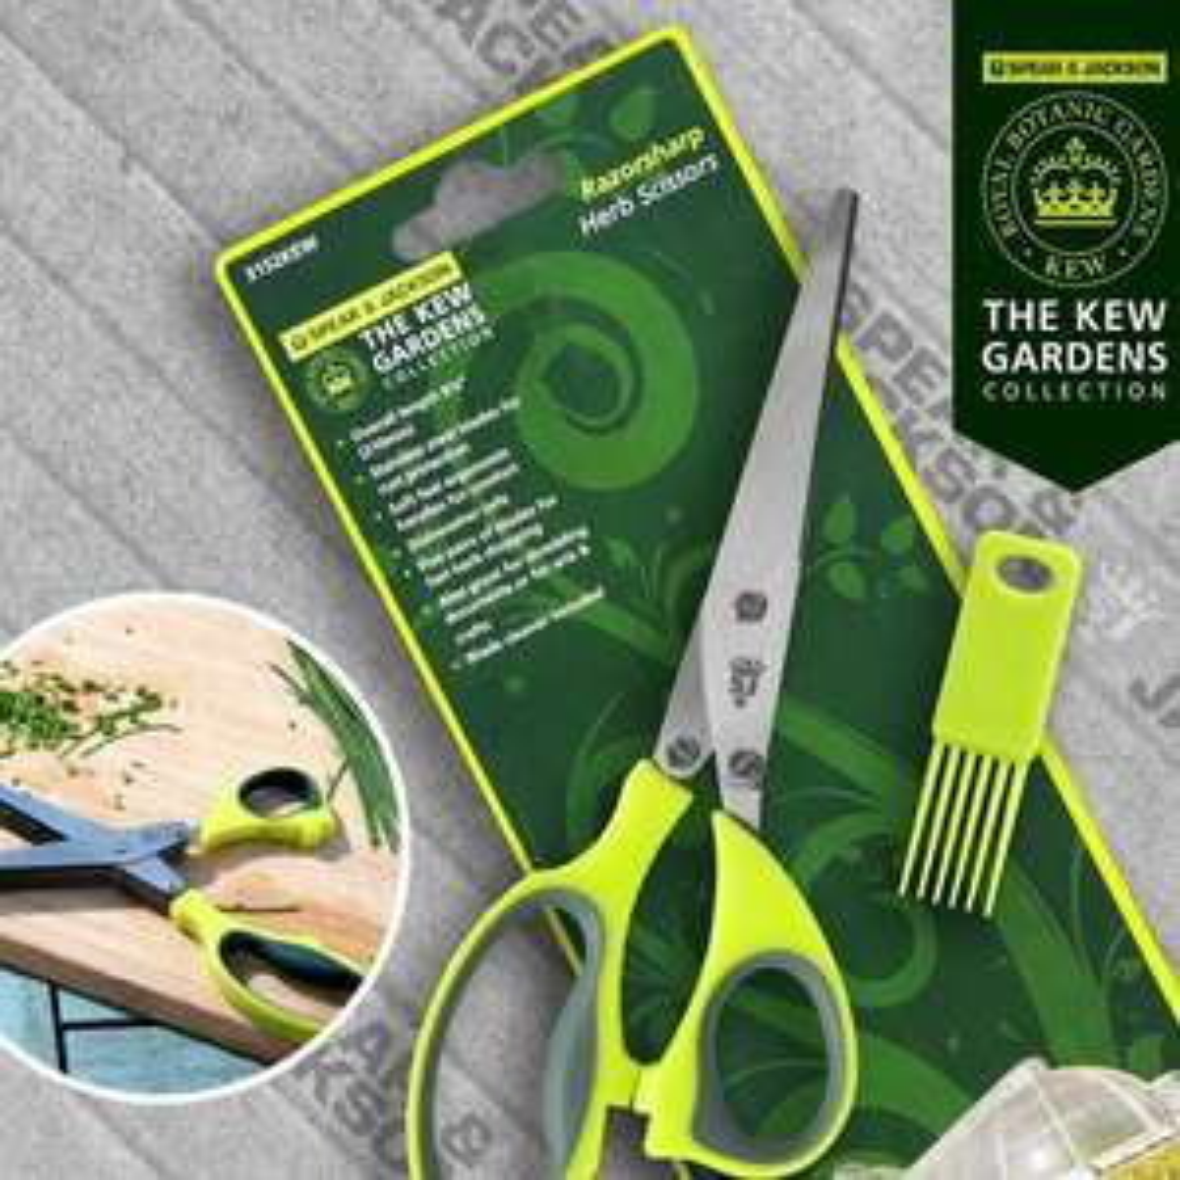 5 blade herb scissors - Spear & Jackson for Kew Gardens £4.95 ebay / ukbrandedtools